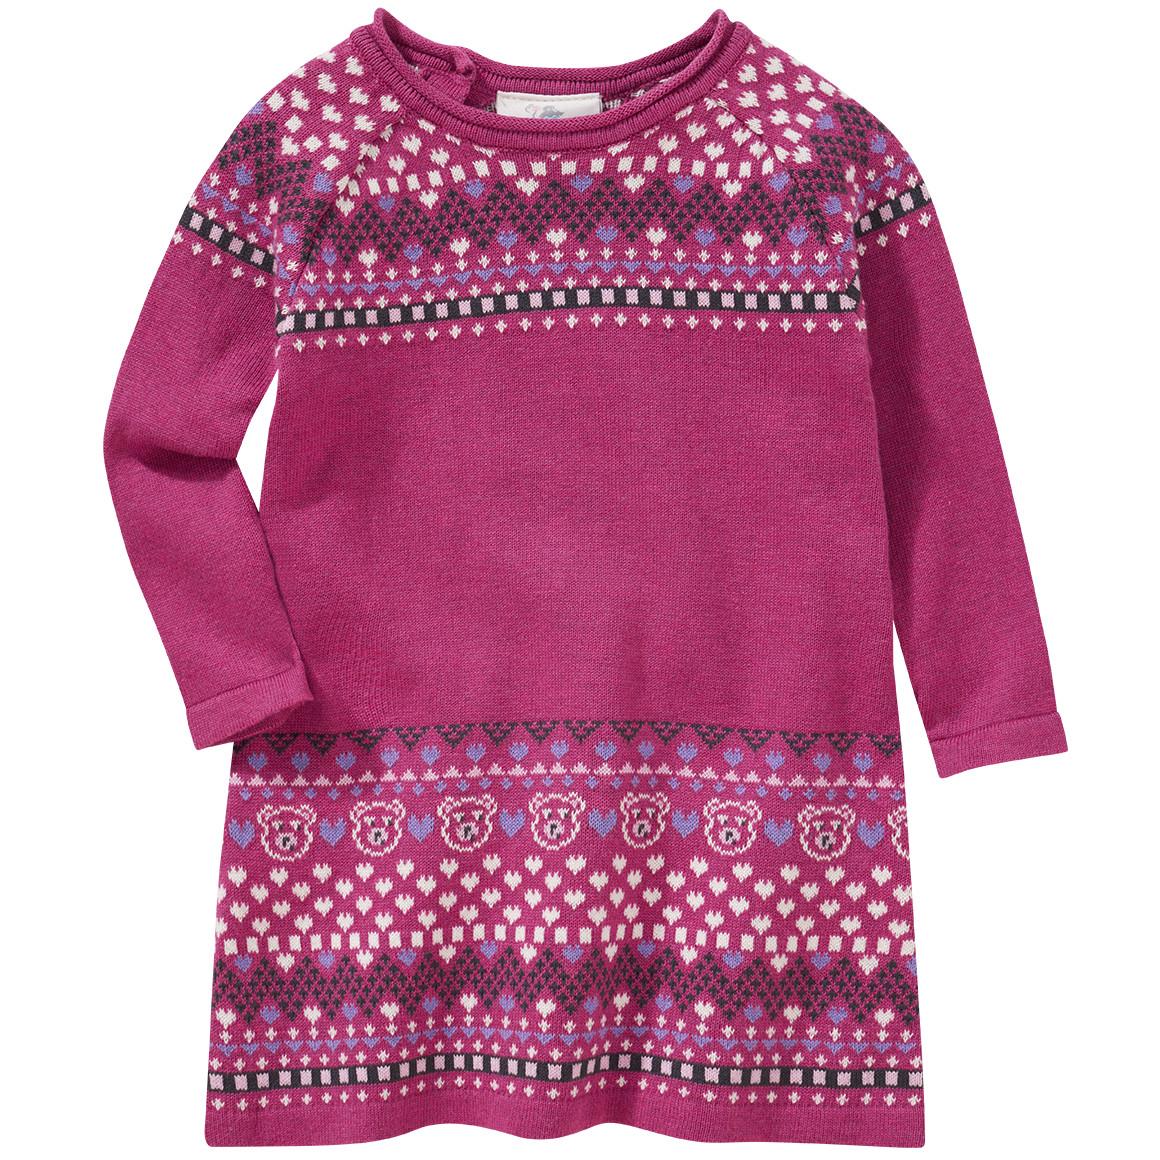 Babykleiderroecke - Baby Strickkleid mit Bordüren Muster - Onlineshop Ernstings family